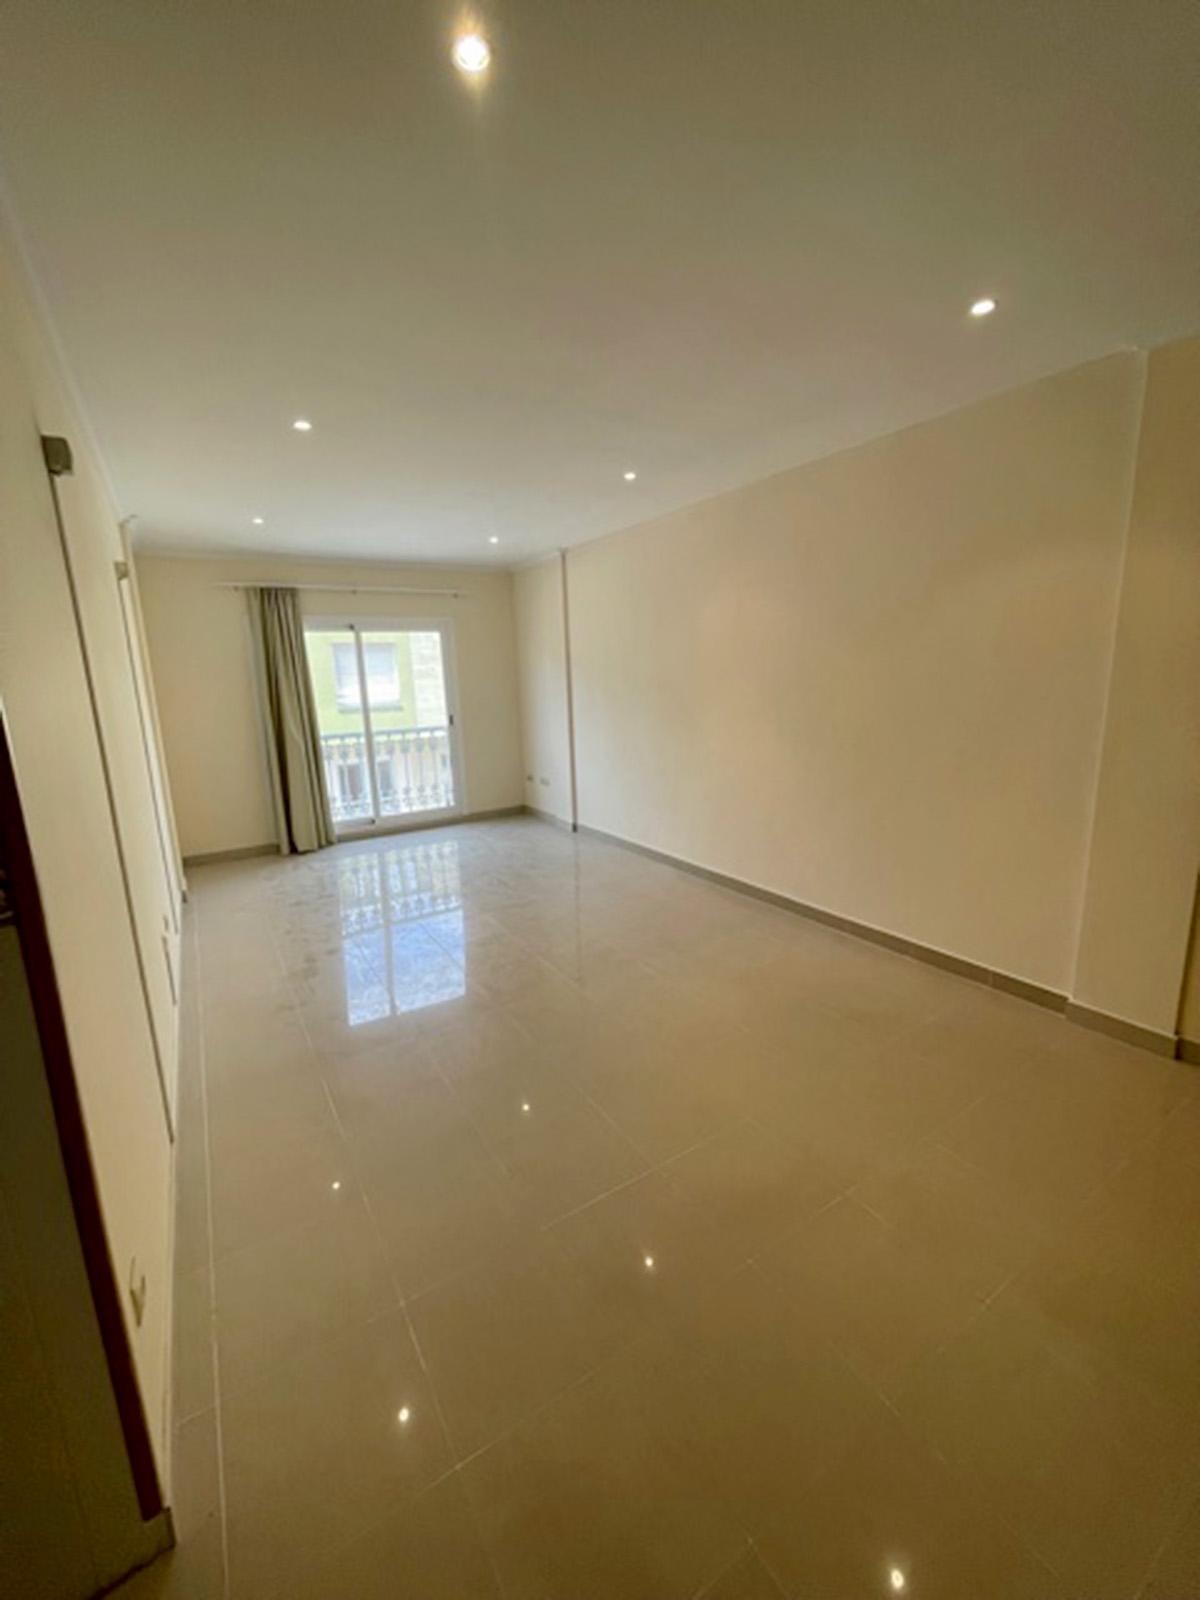 bedroom or living room